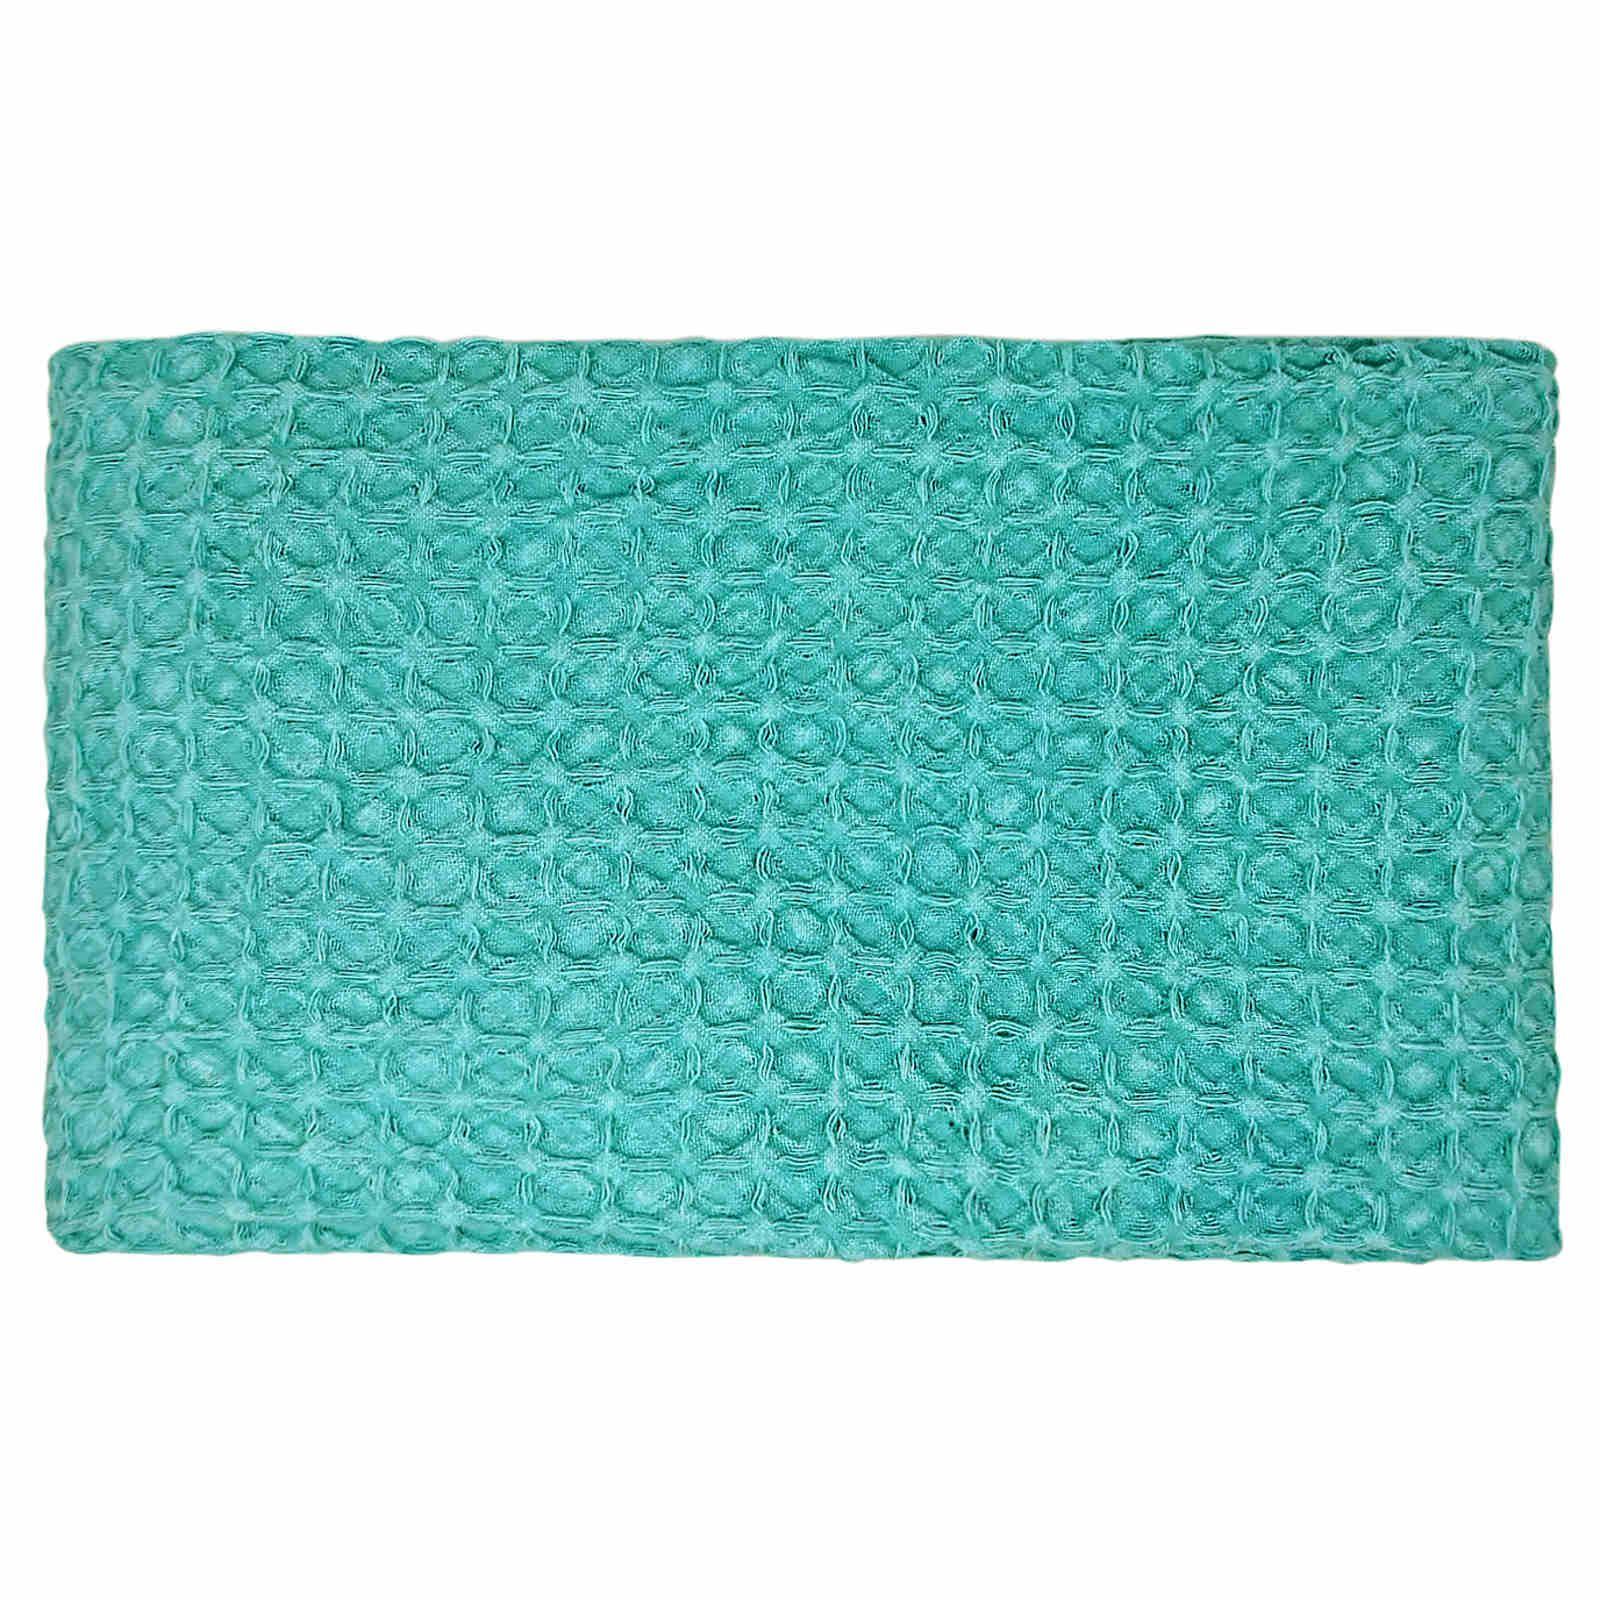 Oregon-Stonewash-Waffle-Throw-Modern-Distressed-Sofa-Bed-Blankets-100-Cotton thumbnail 5